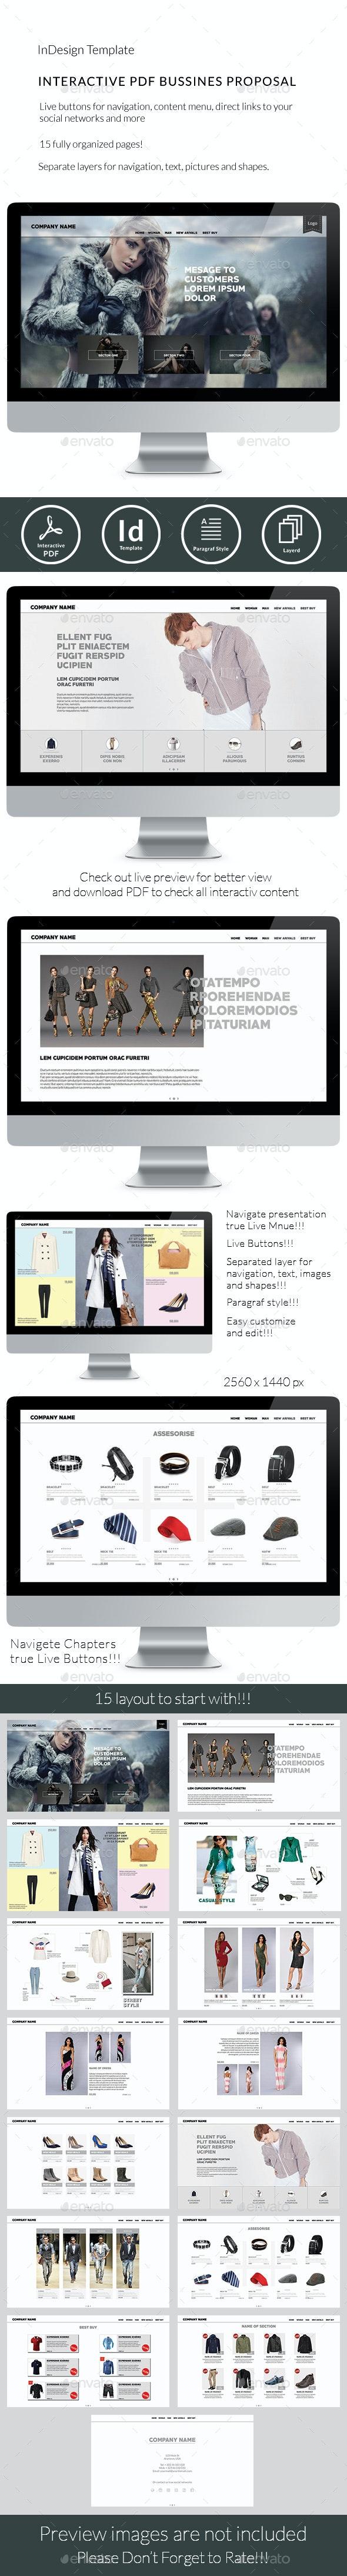 Interactive PDF Catalogue - ePublishing